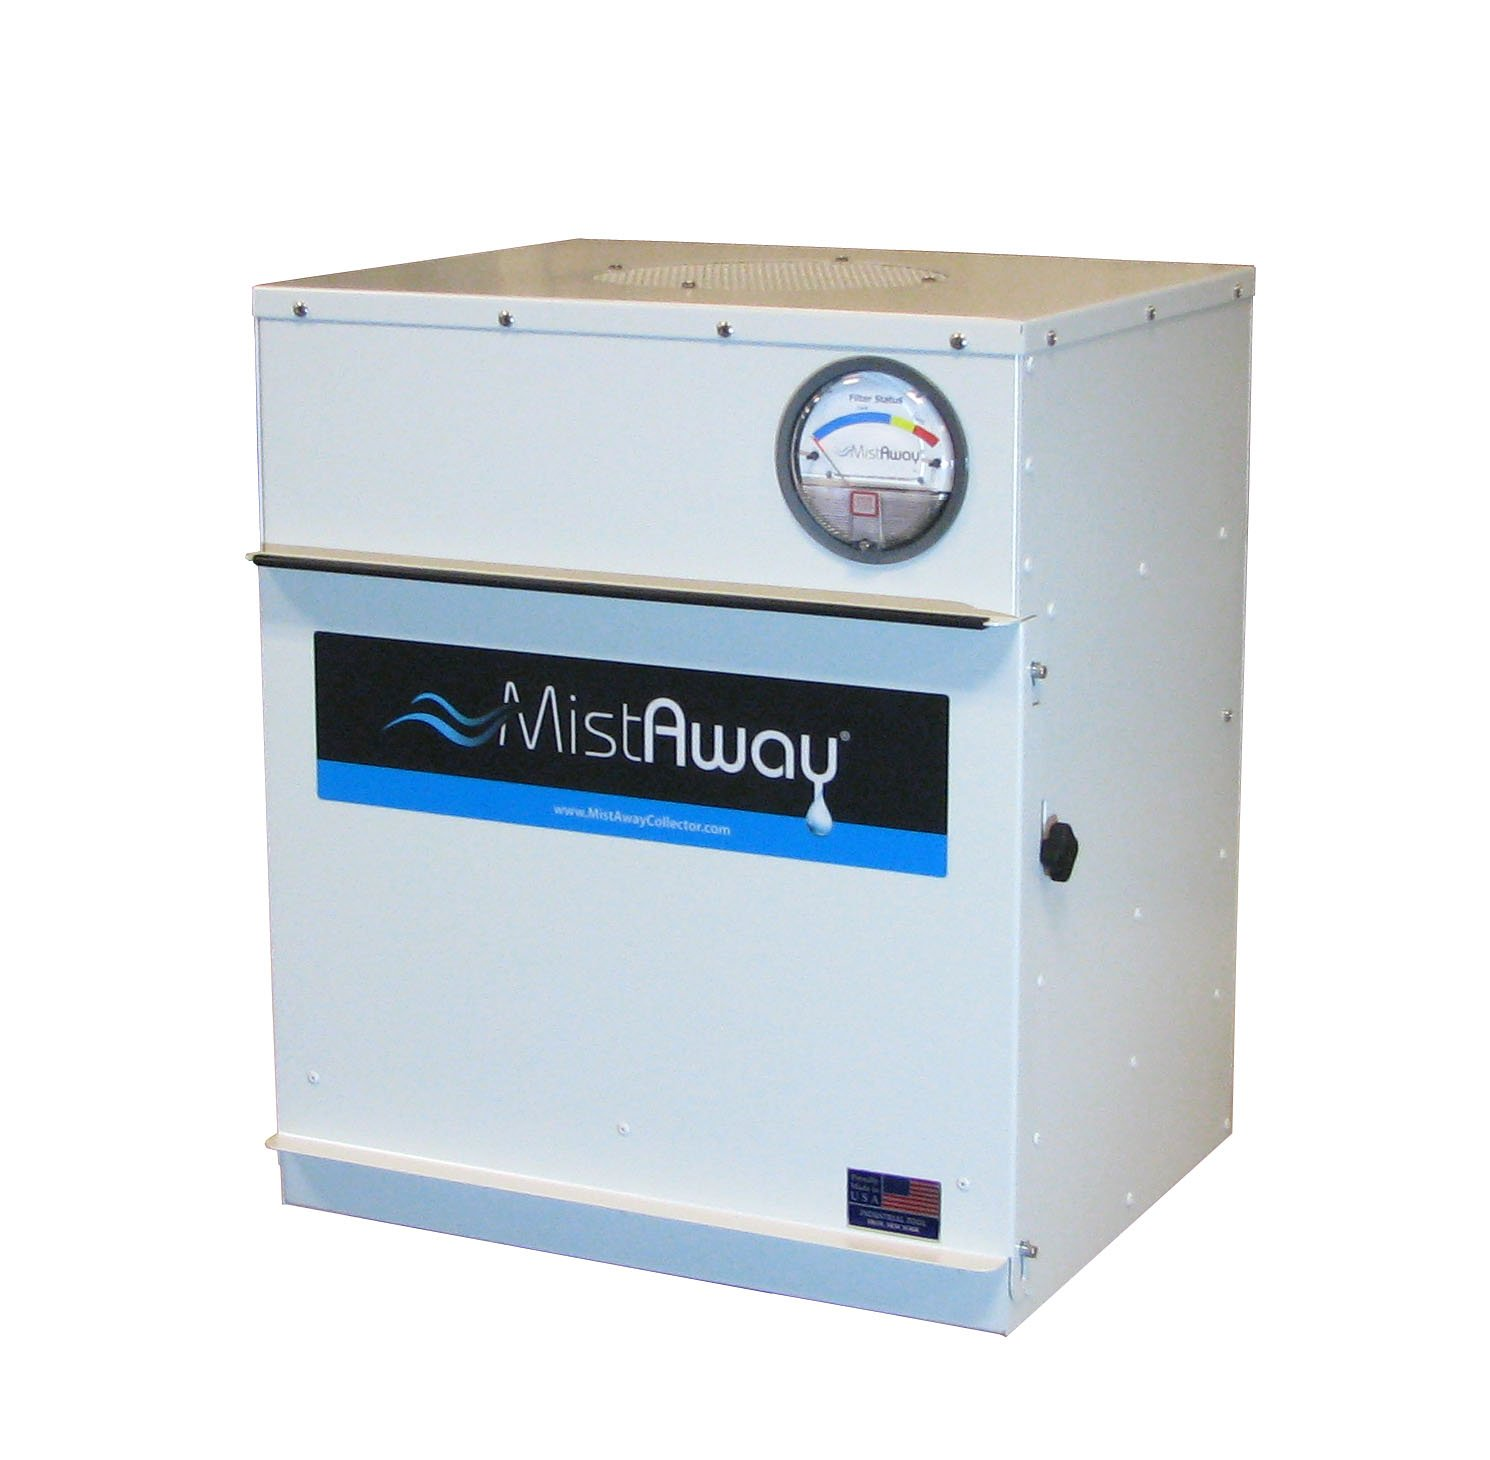 Mistaway Oil Mist Collector, MA700B, 700 CFM by MistawayCollector.com